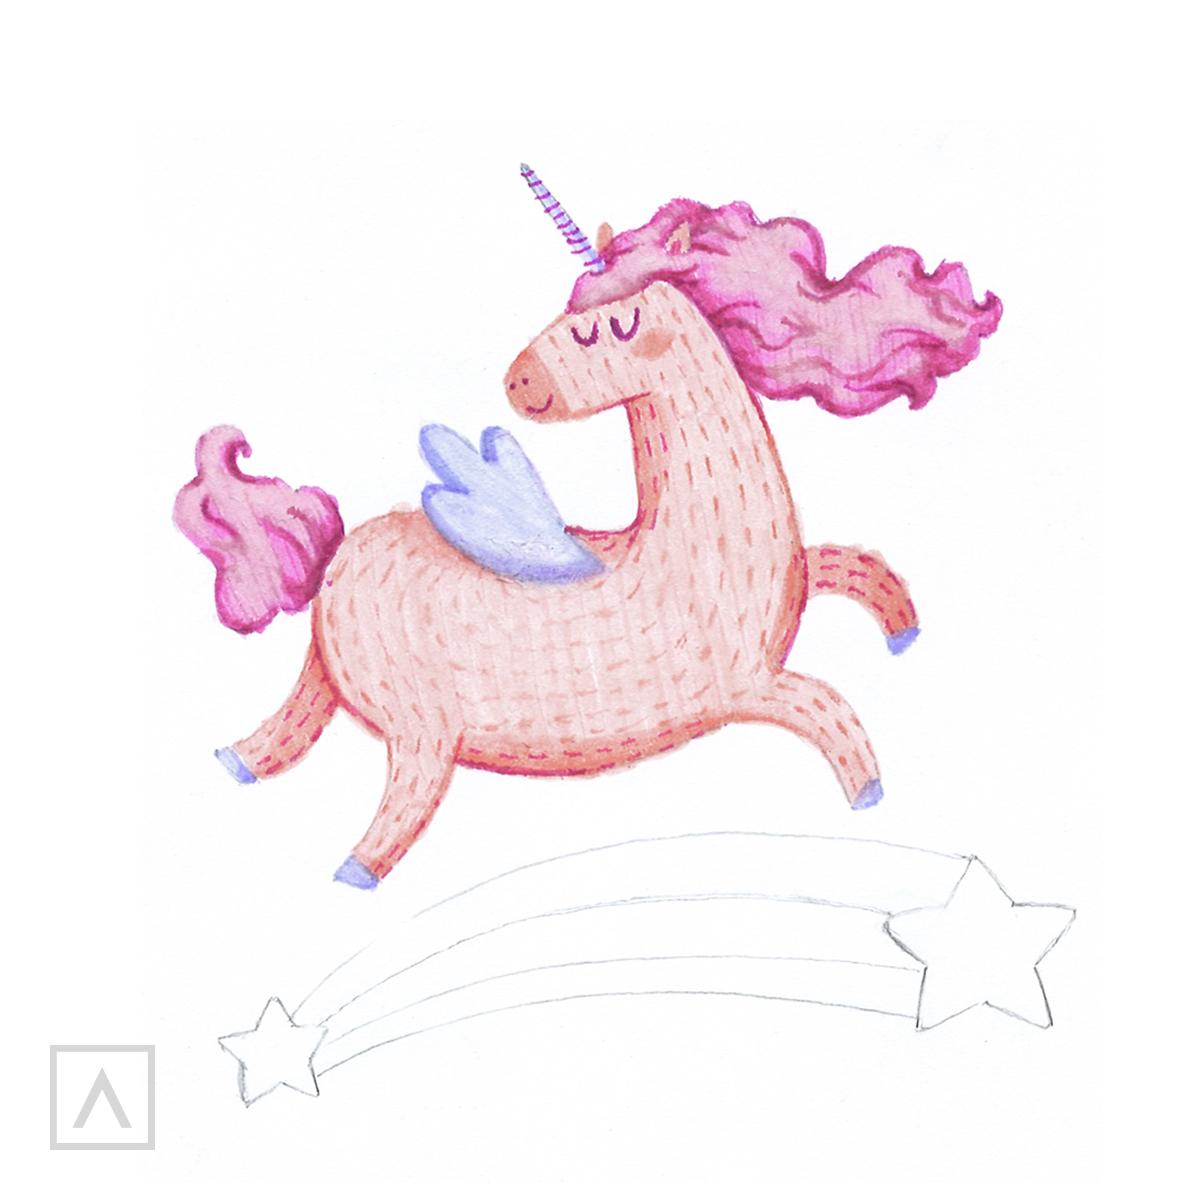 How to Draw a Unicorn - Step 9